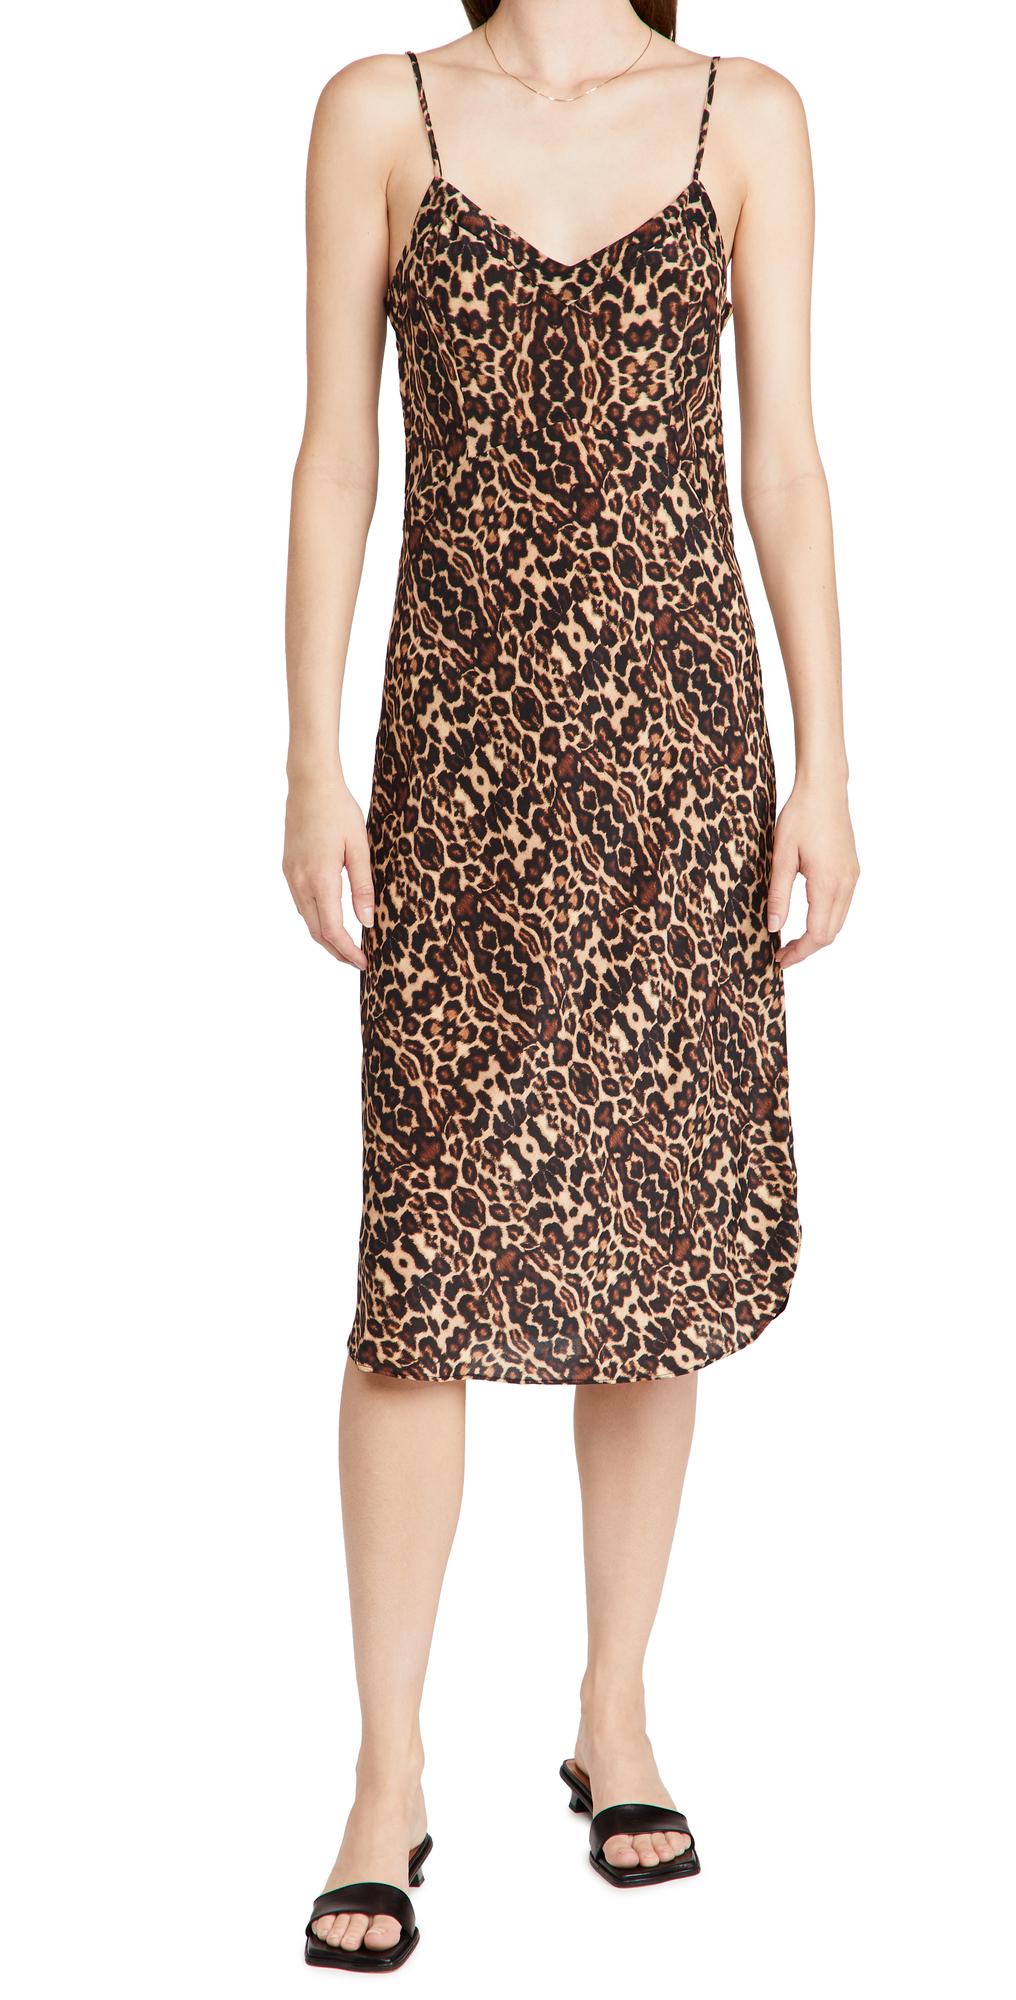 Carolyne Slip Dress